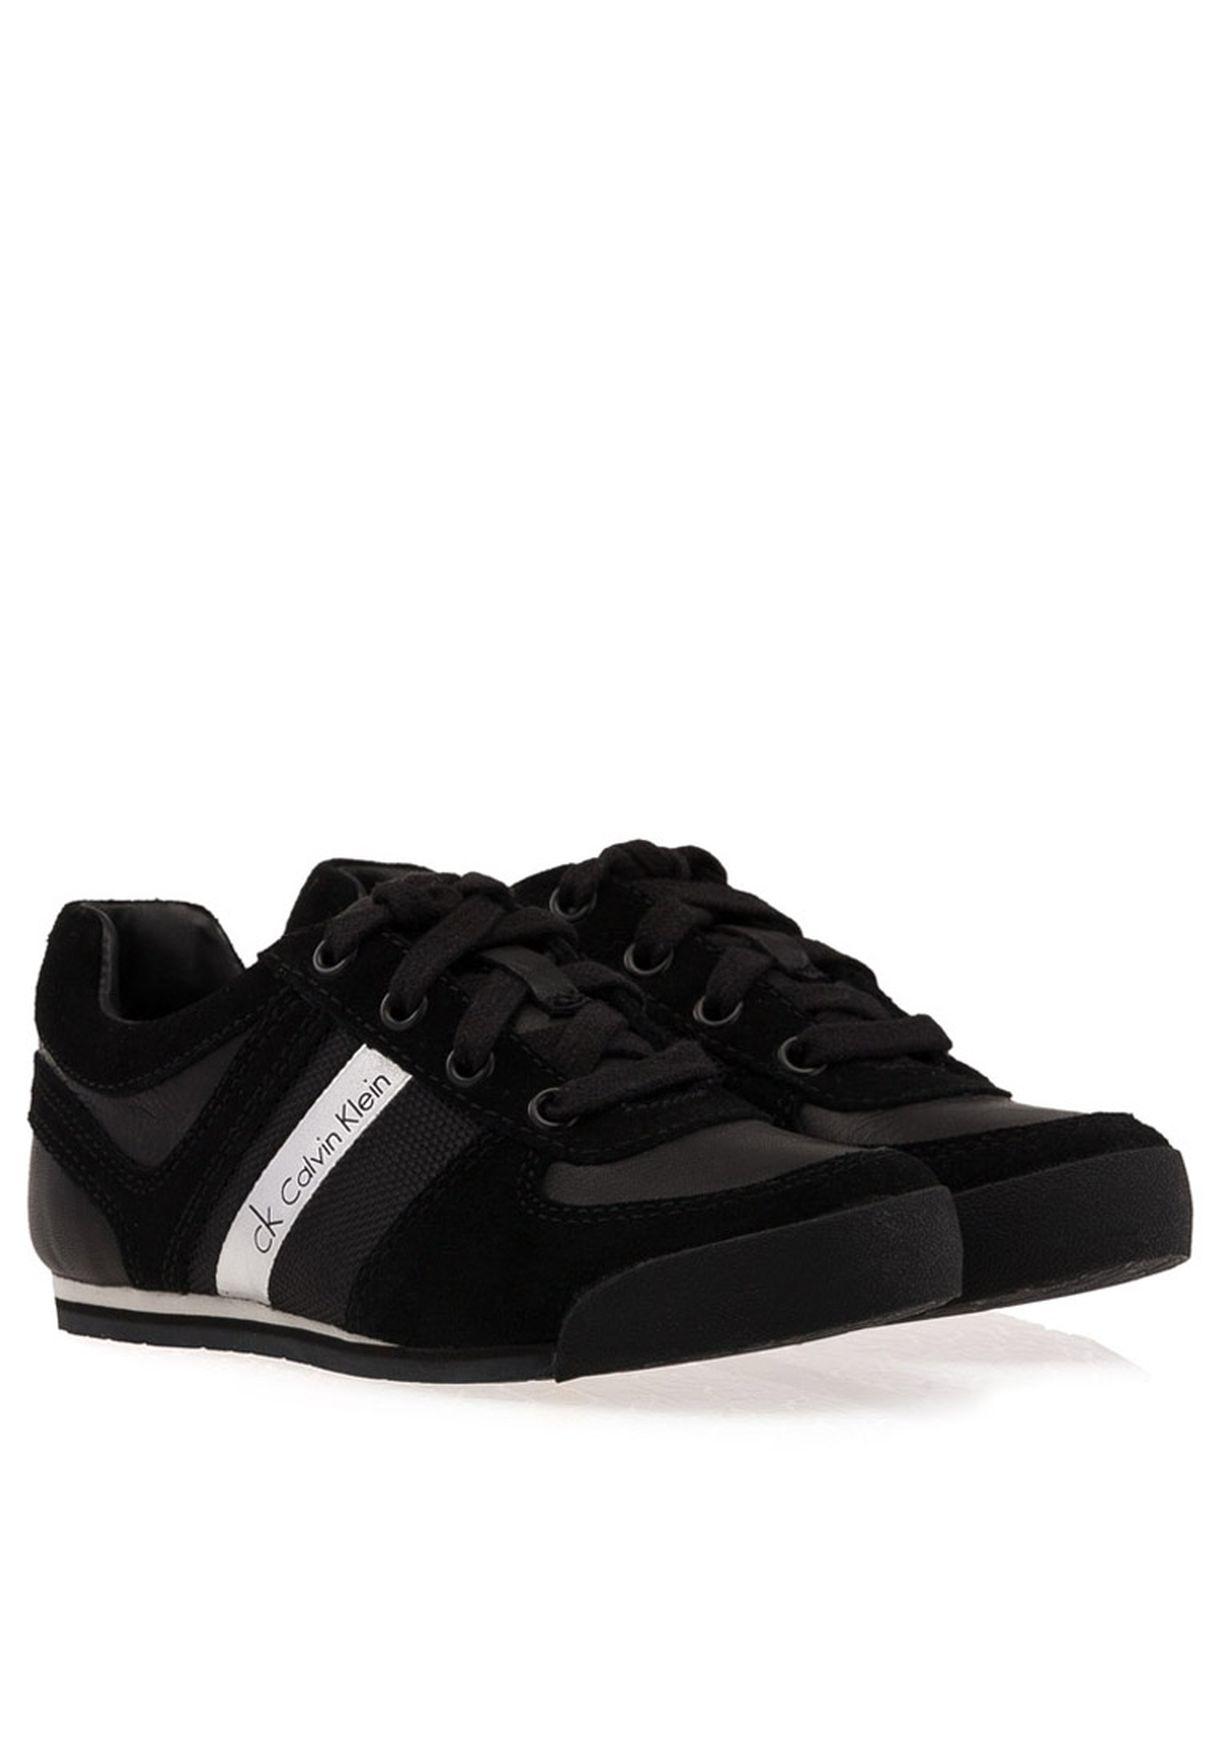 Calvin Klein Jeans black Chad Trainers